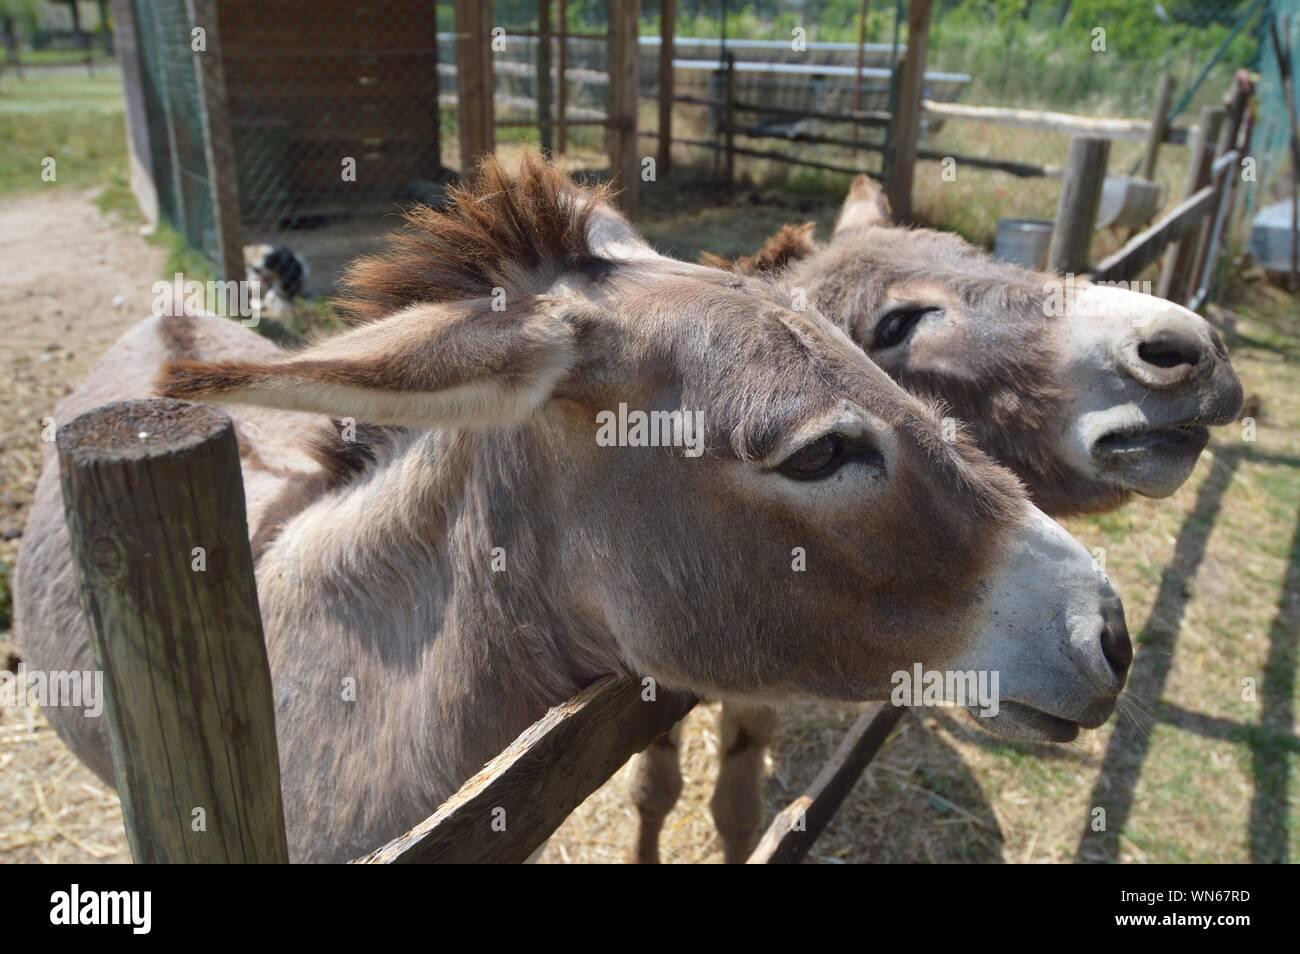 Close-up Portrait Of Donkeys Stock Photo